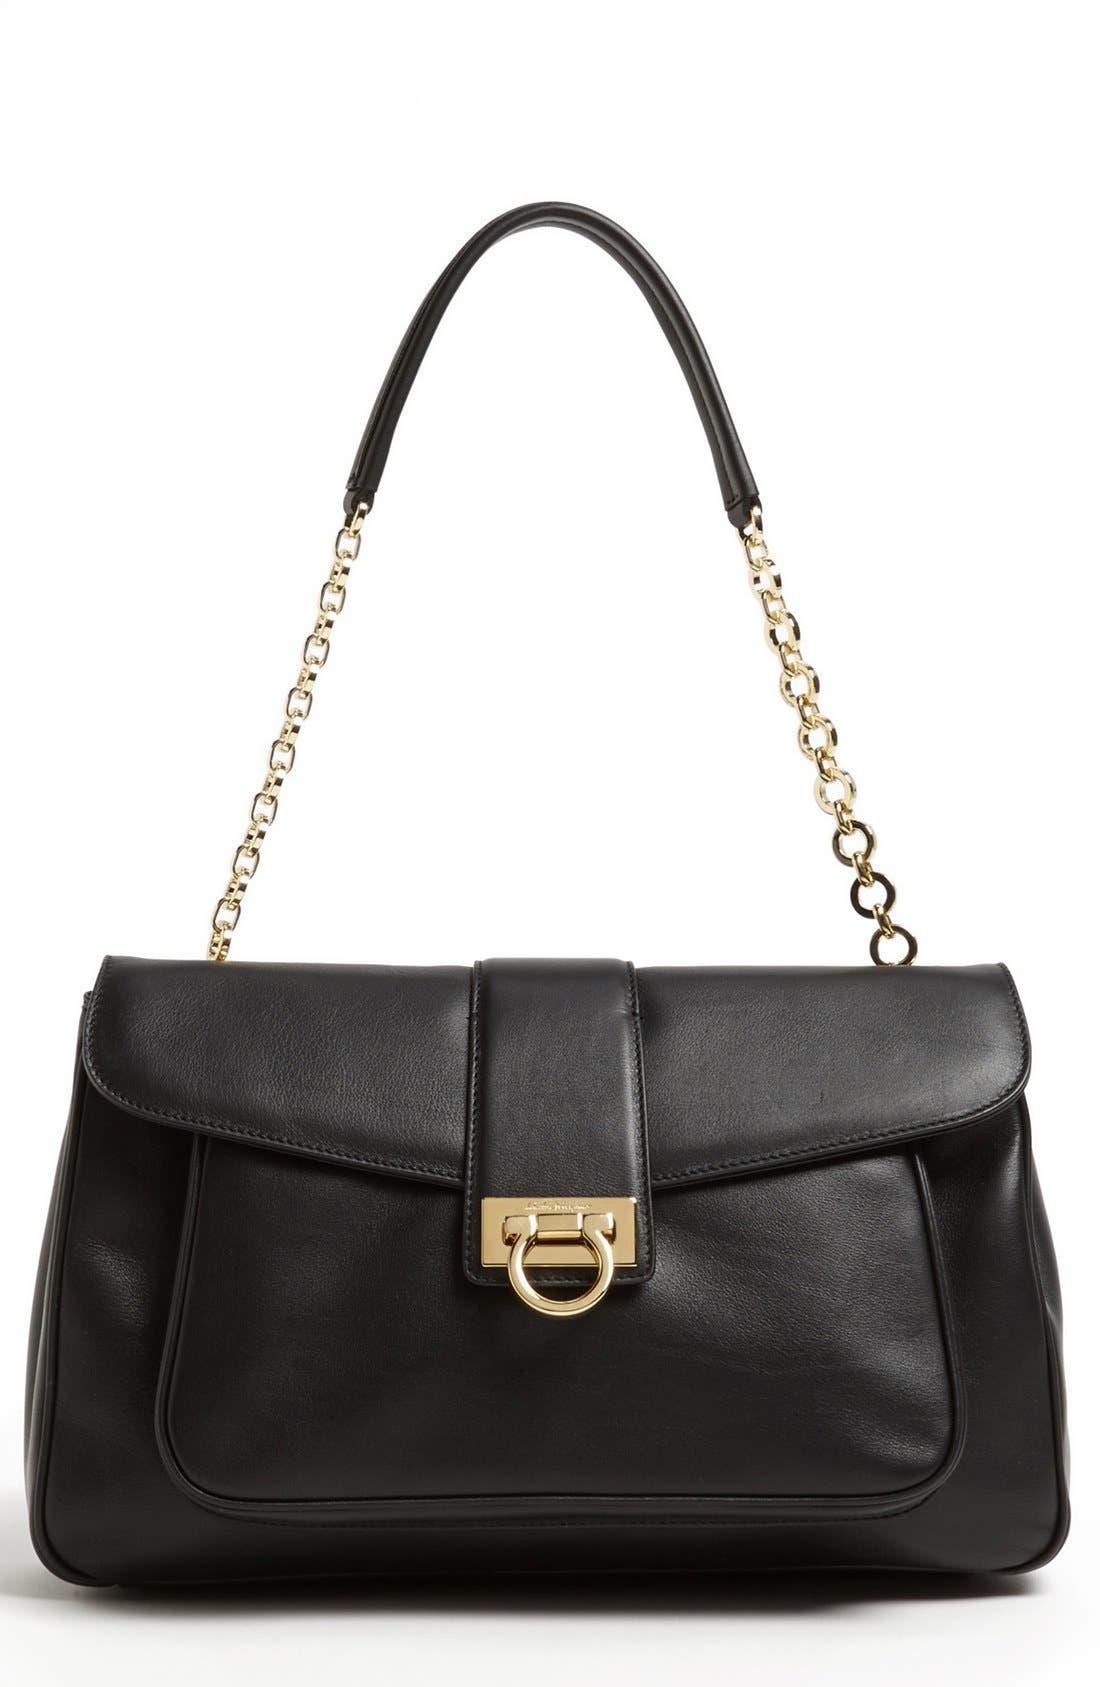 Alternate Image 1 Selected - Salvatore Ferragamo 'Paula' Leather Shoulder Bag